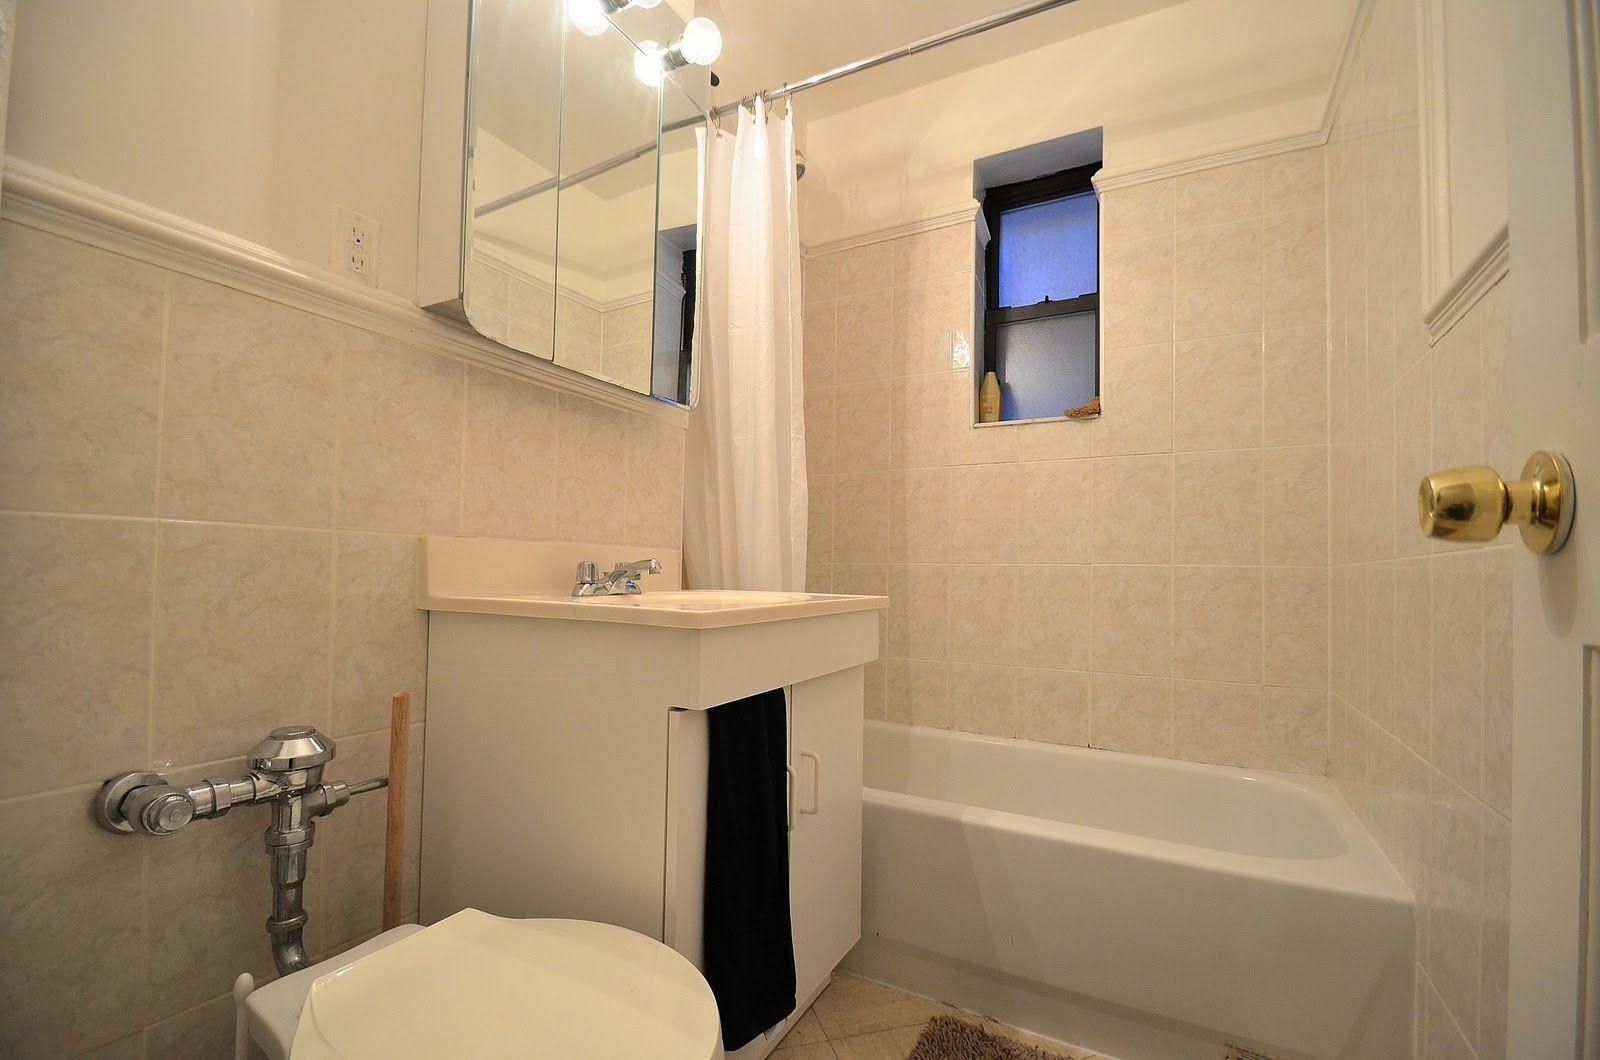 Captivating Small Bathroom Ideas No Window